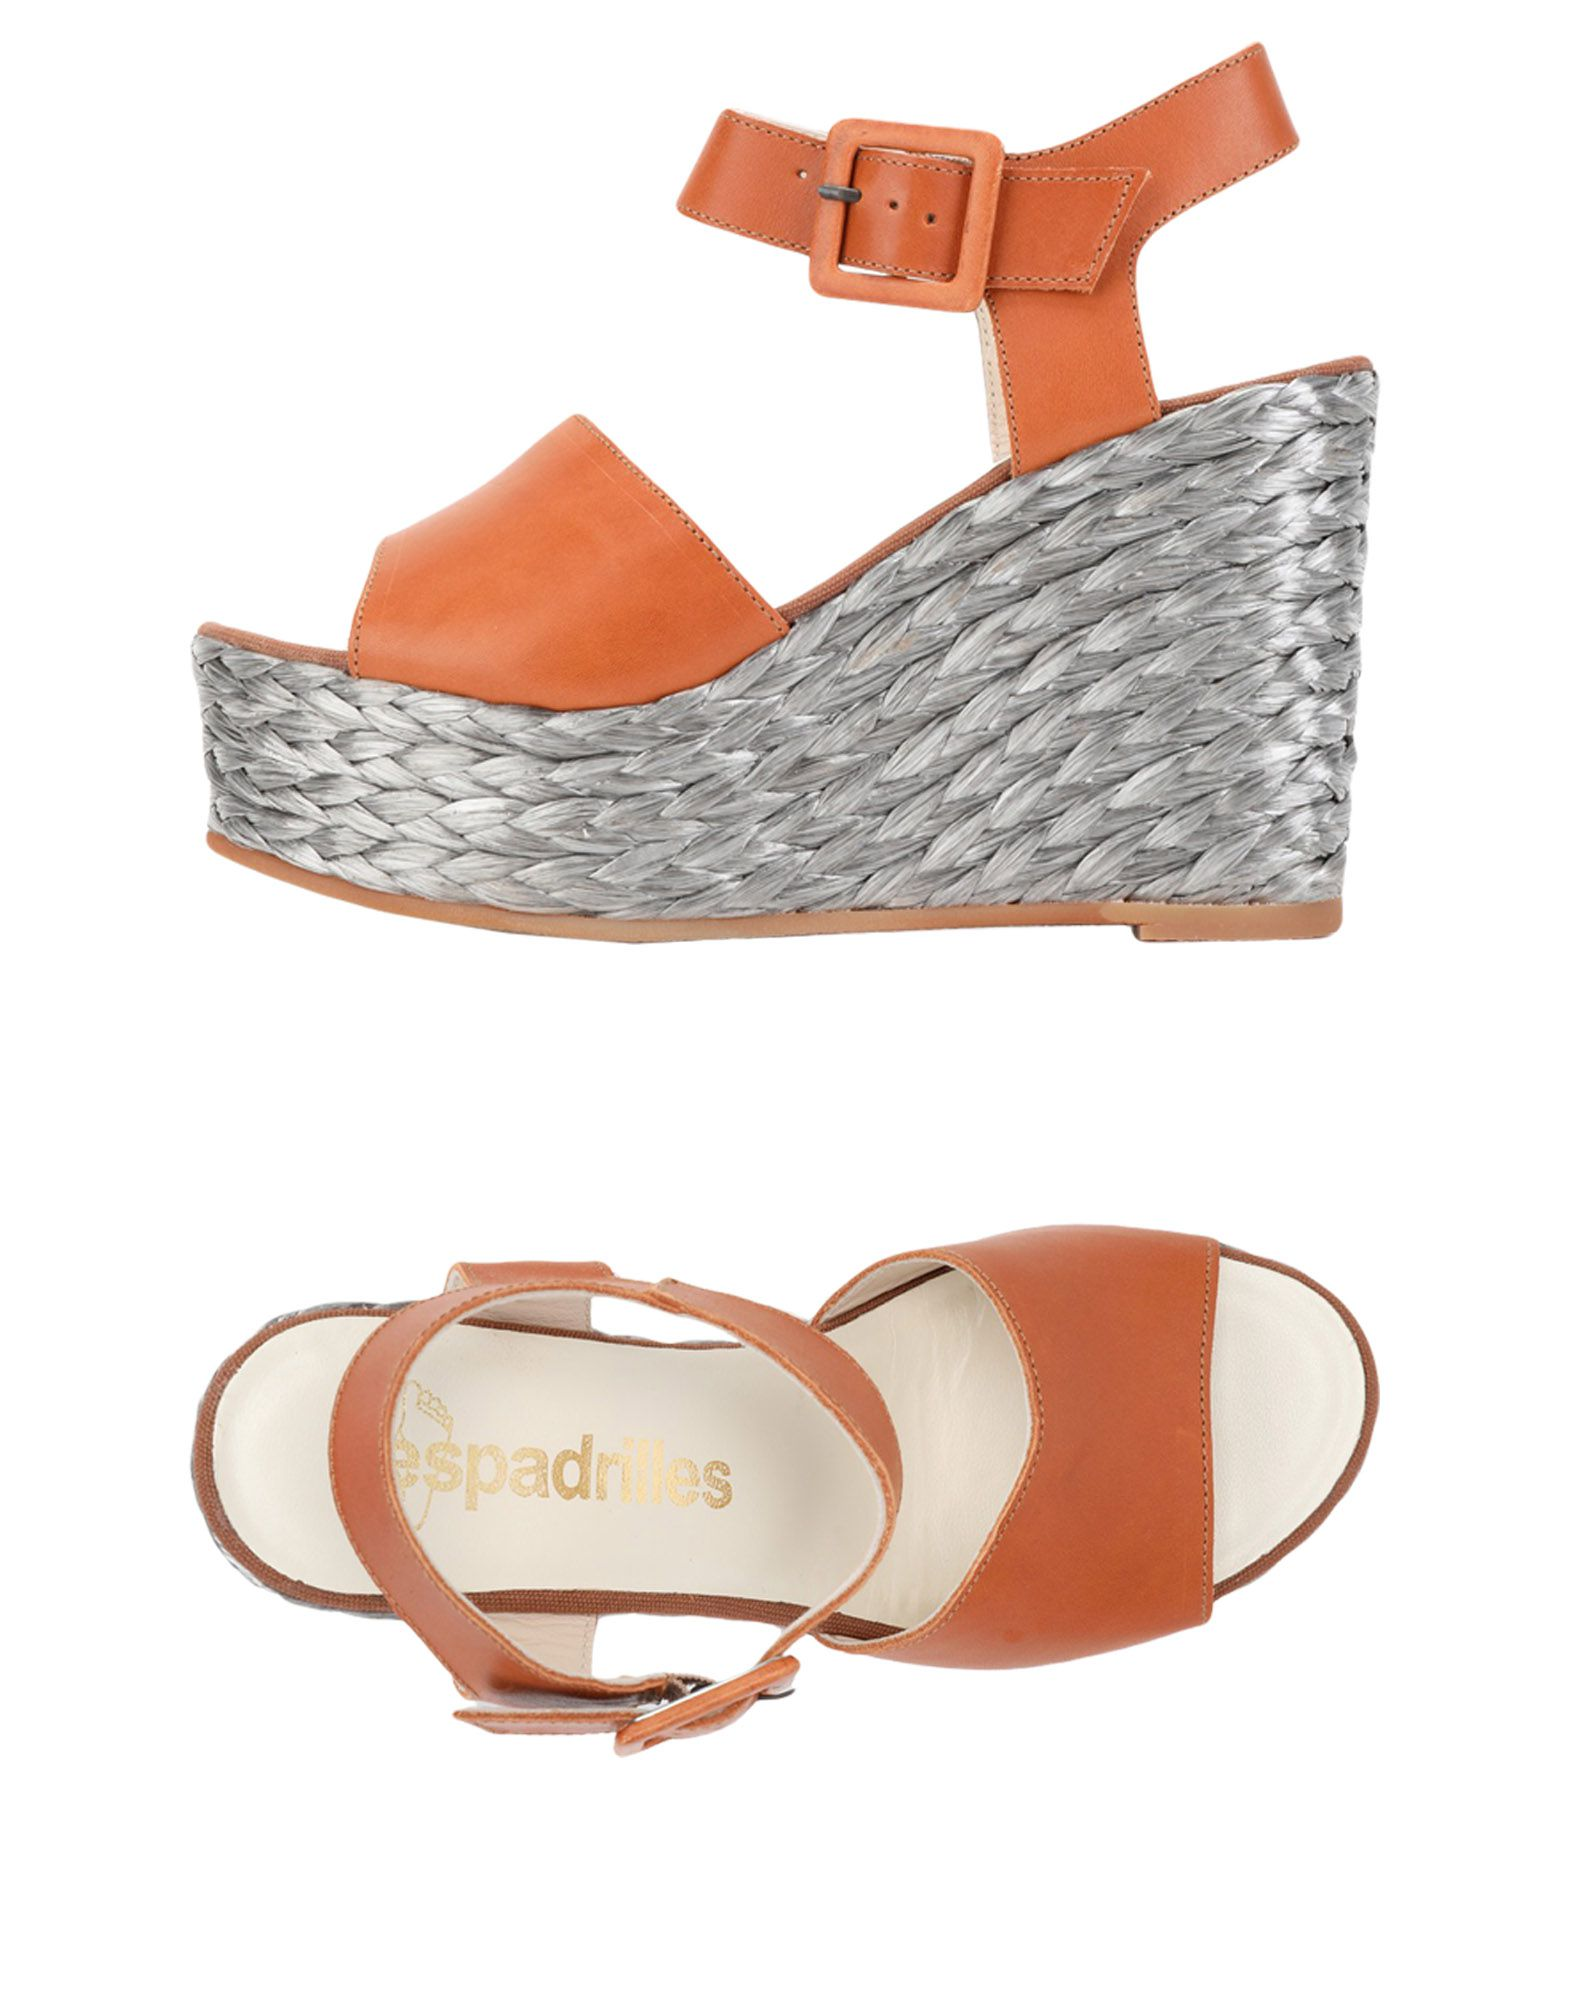 Espadrilles Sandals - Women Espadrilles Sandals  online on  Sandals Canada - 11356608KL 87eb18